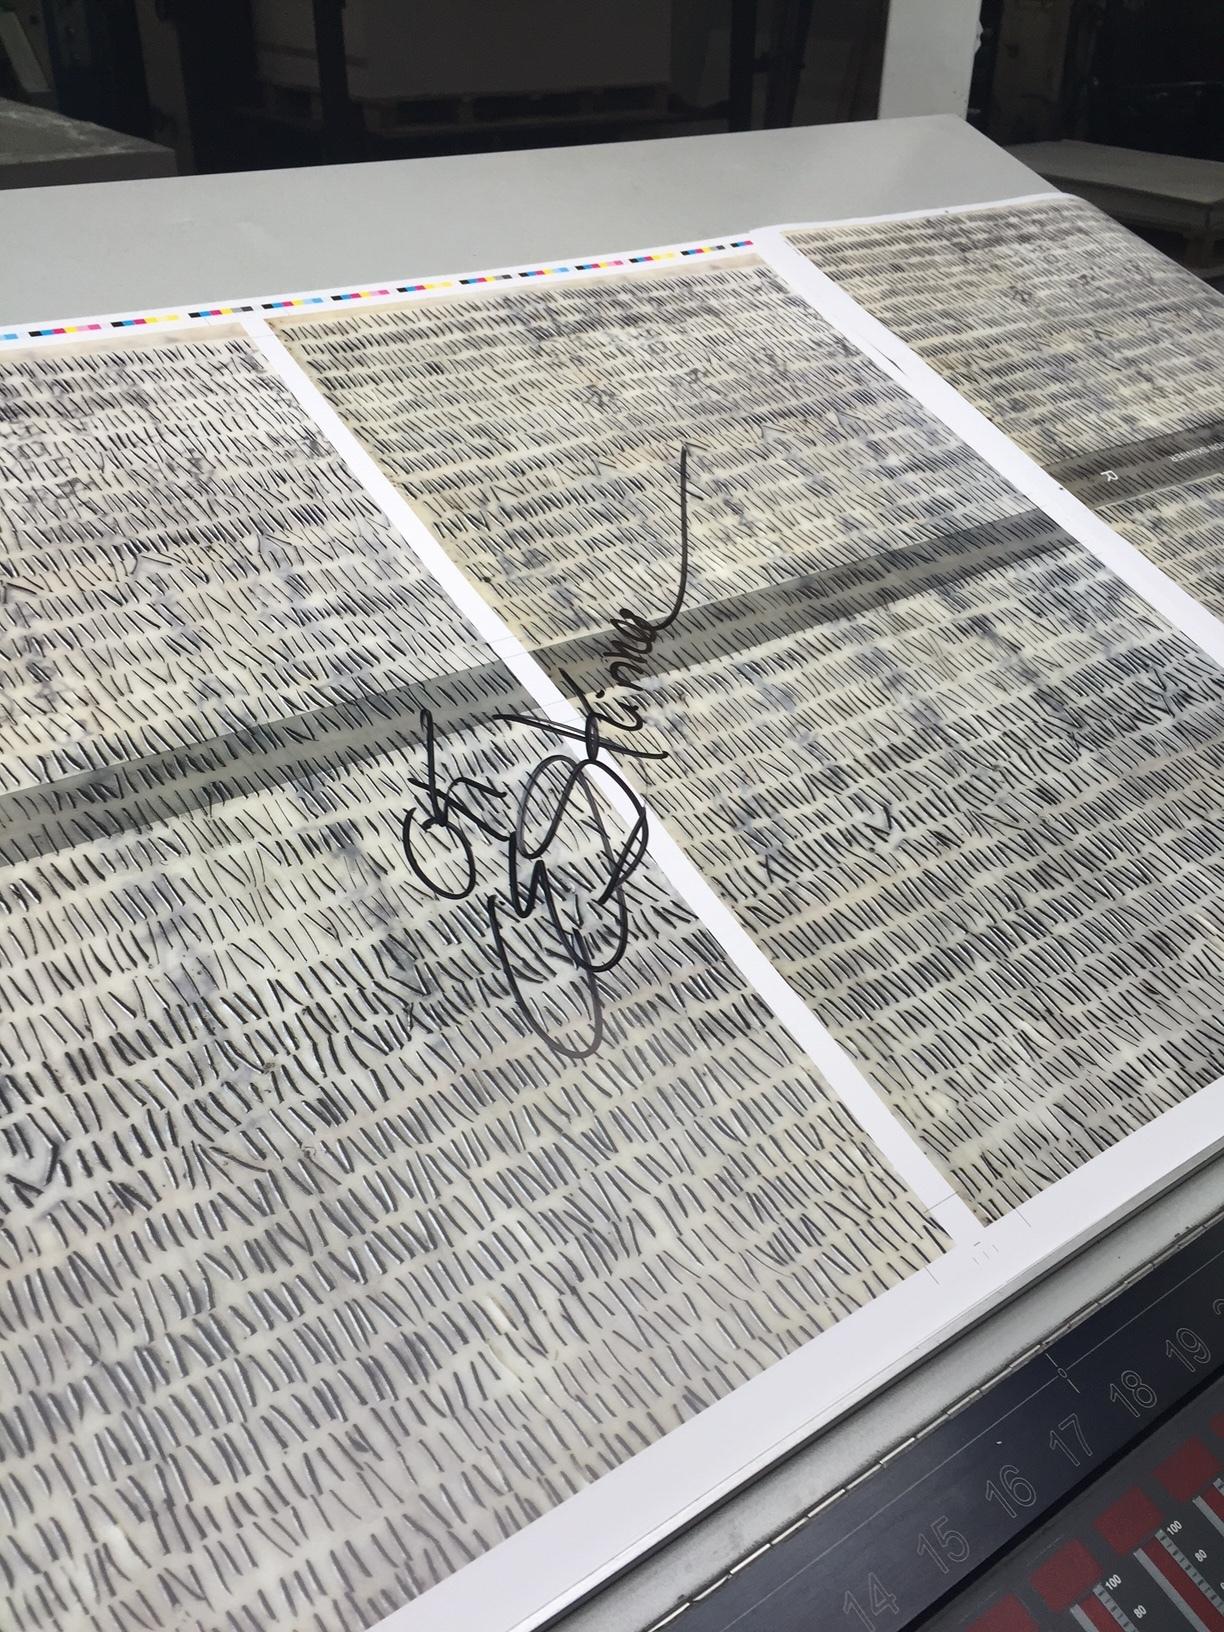 108 in print production Verona, Italy